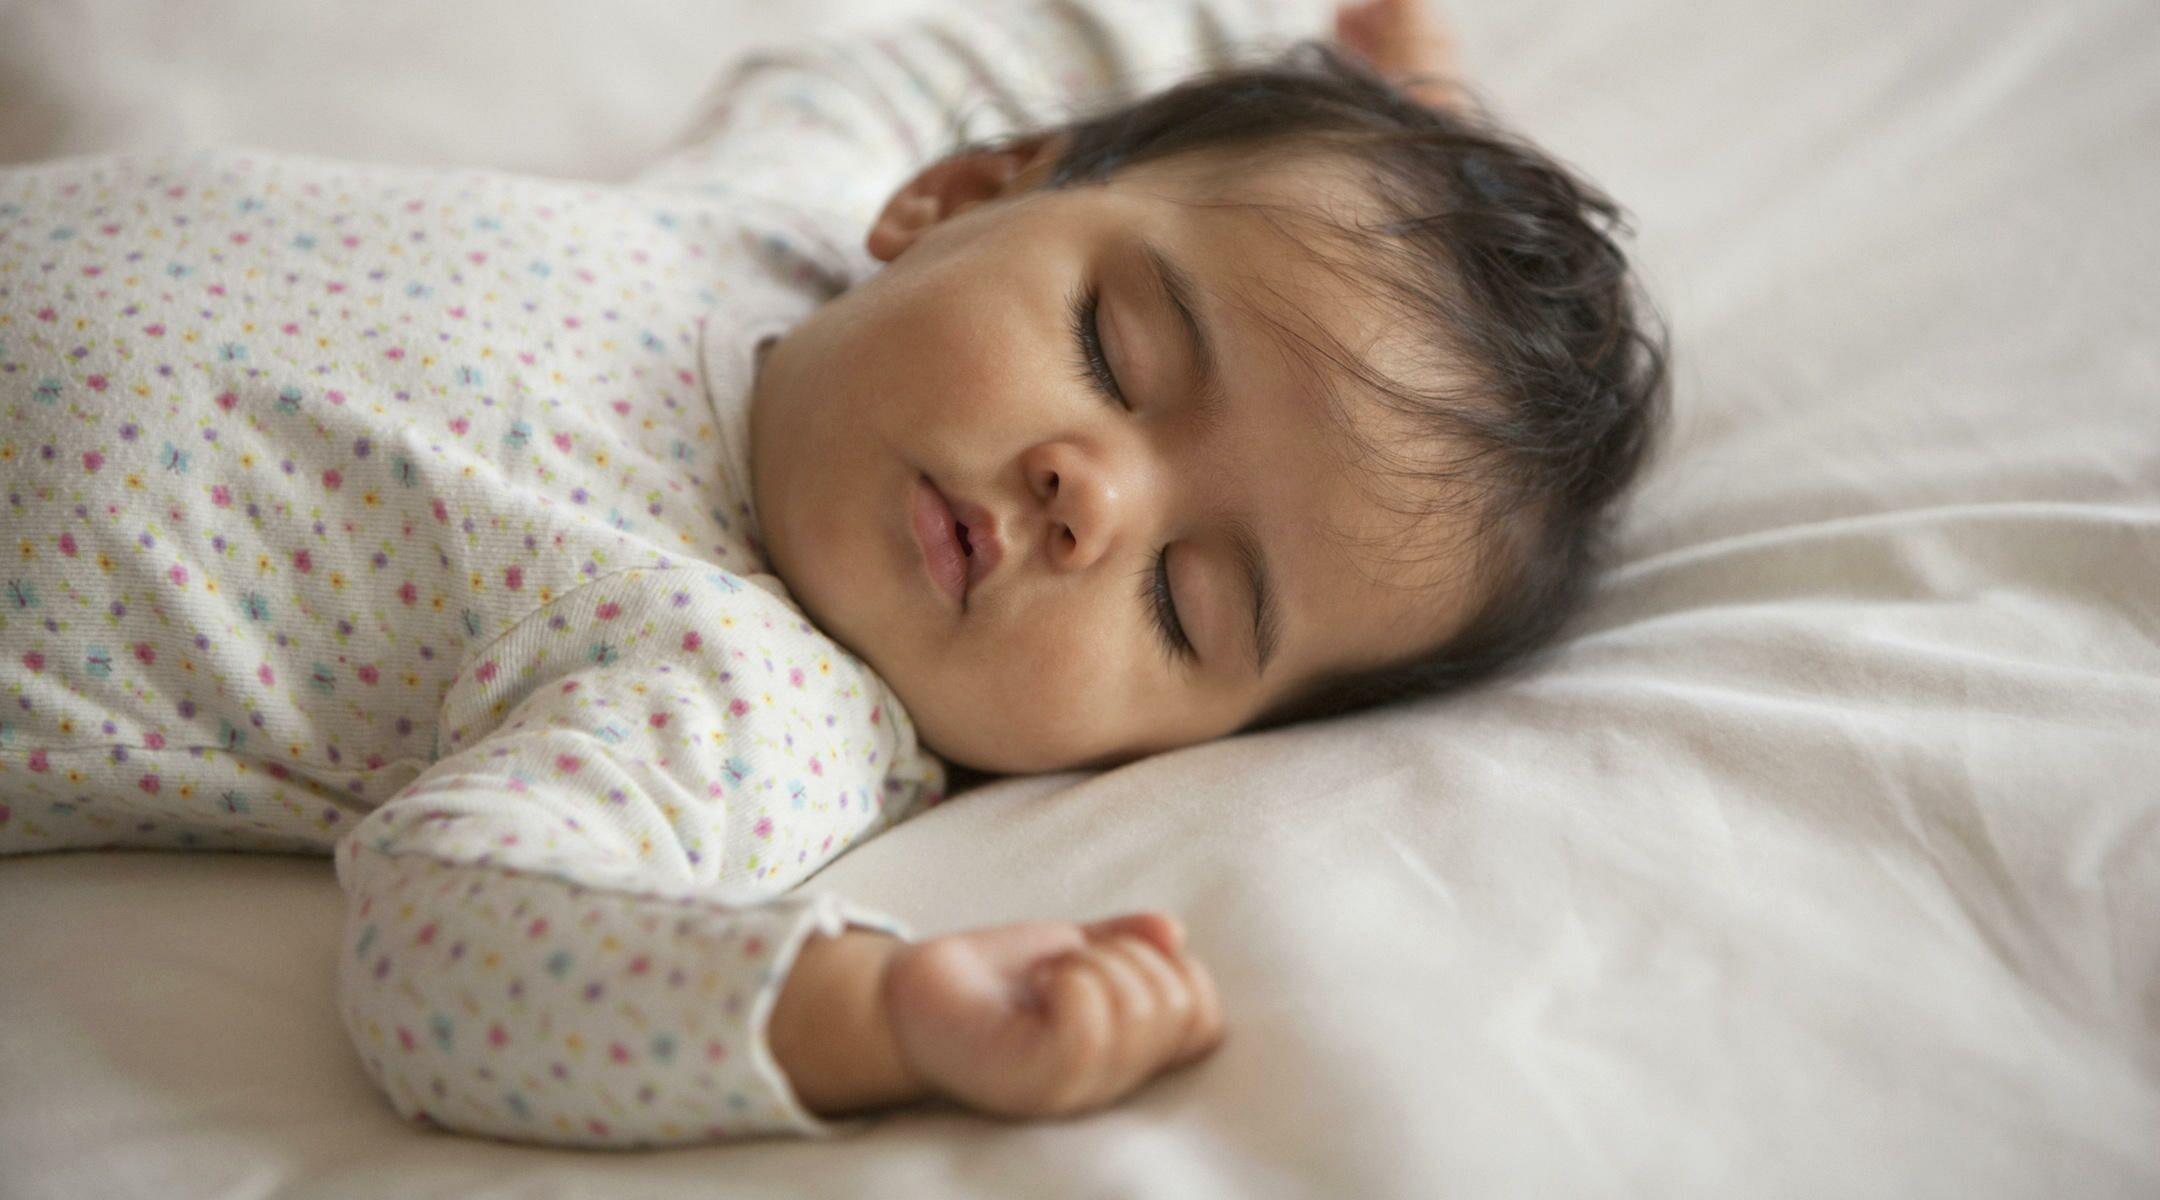 When Do Babies Sleep All Night?